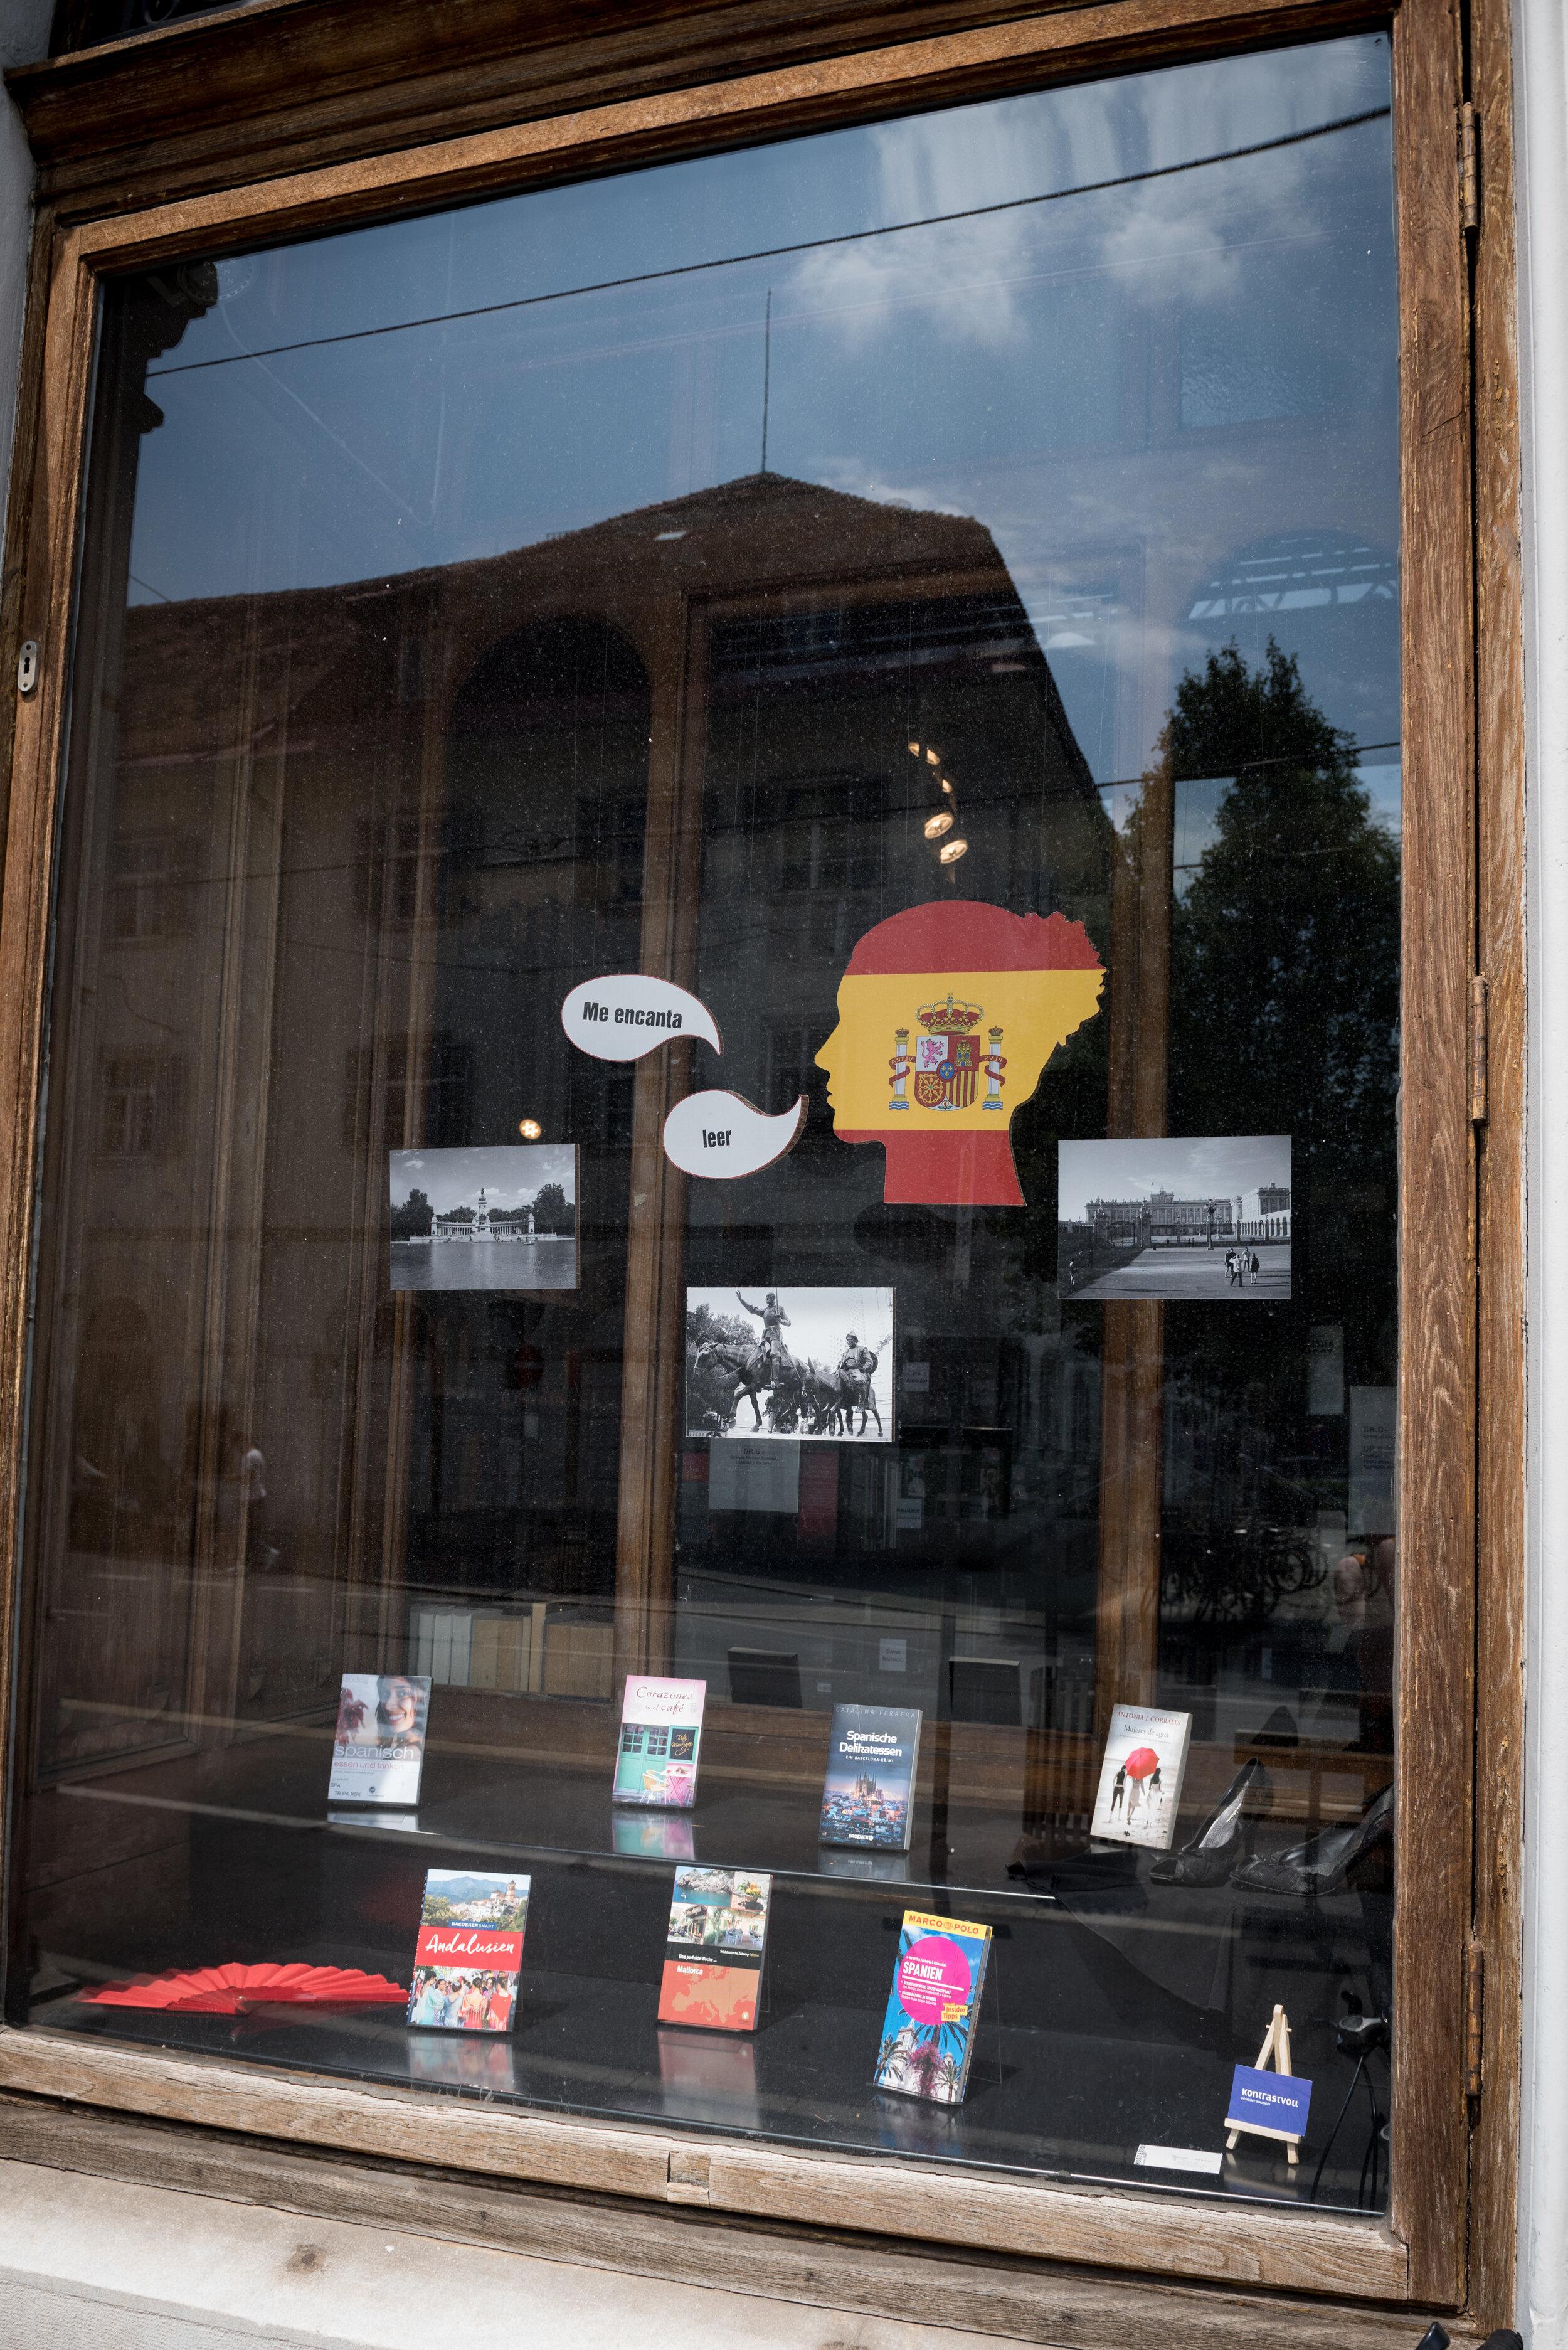 Kontrastvoll-Schaufenster-Hauptbibilothek-Graz-Foto-Andy-Joe-4.jpg